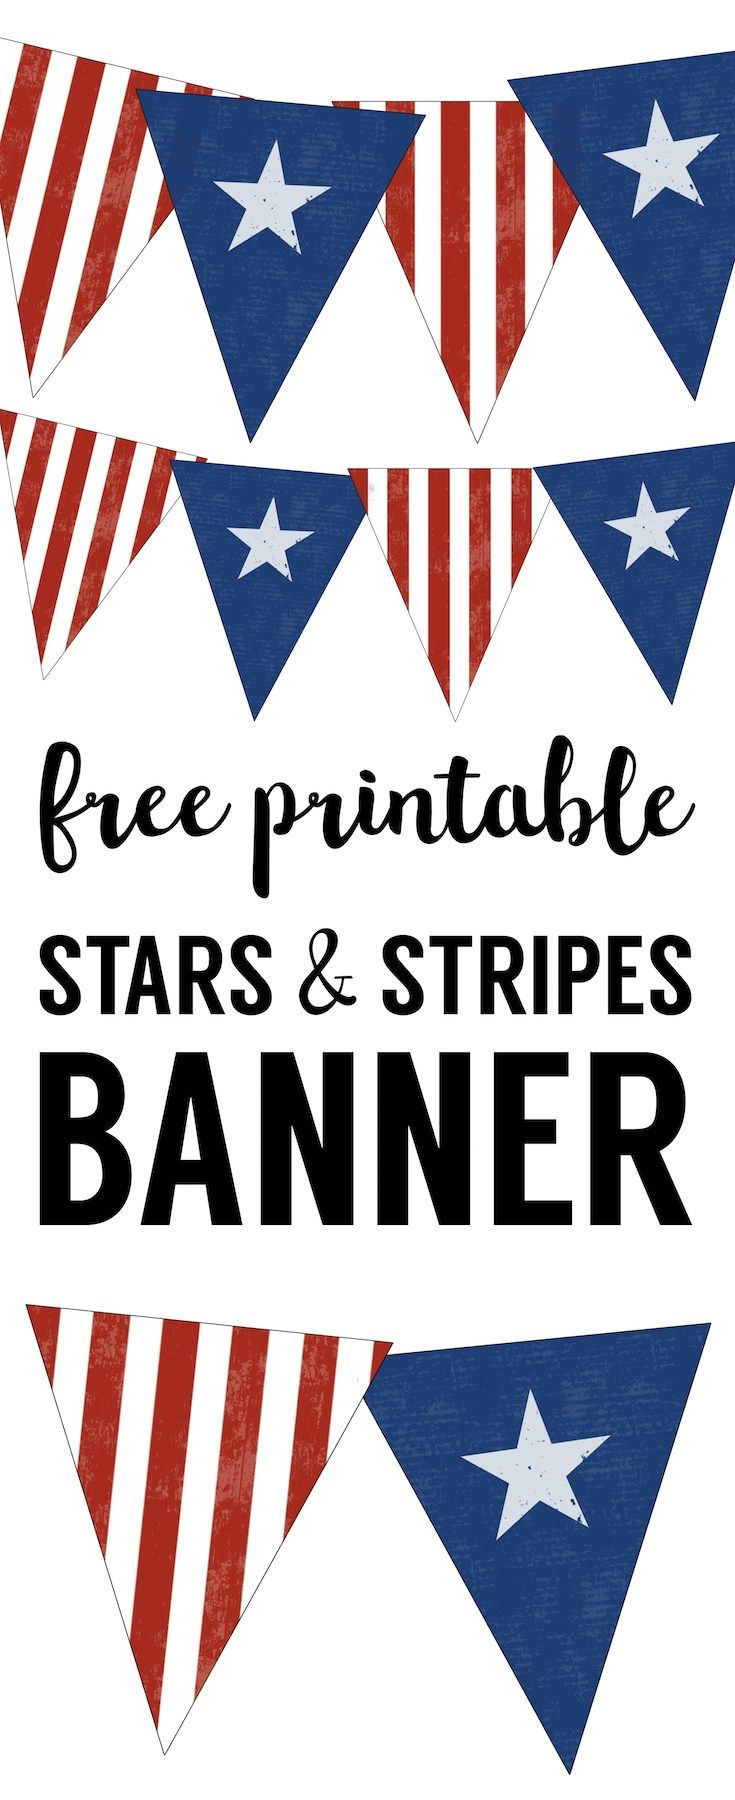 stars and stripes banner free printable free printable banners